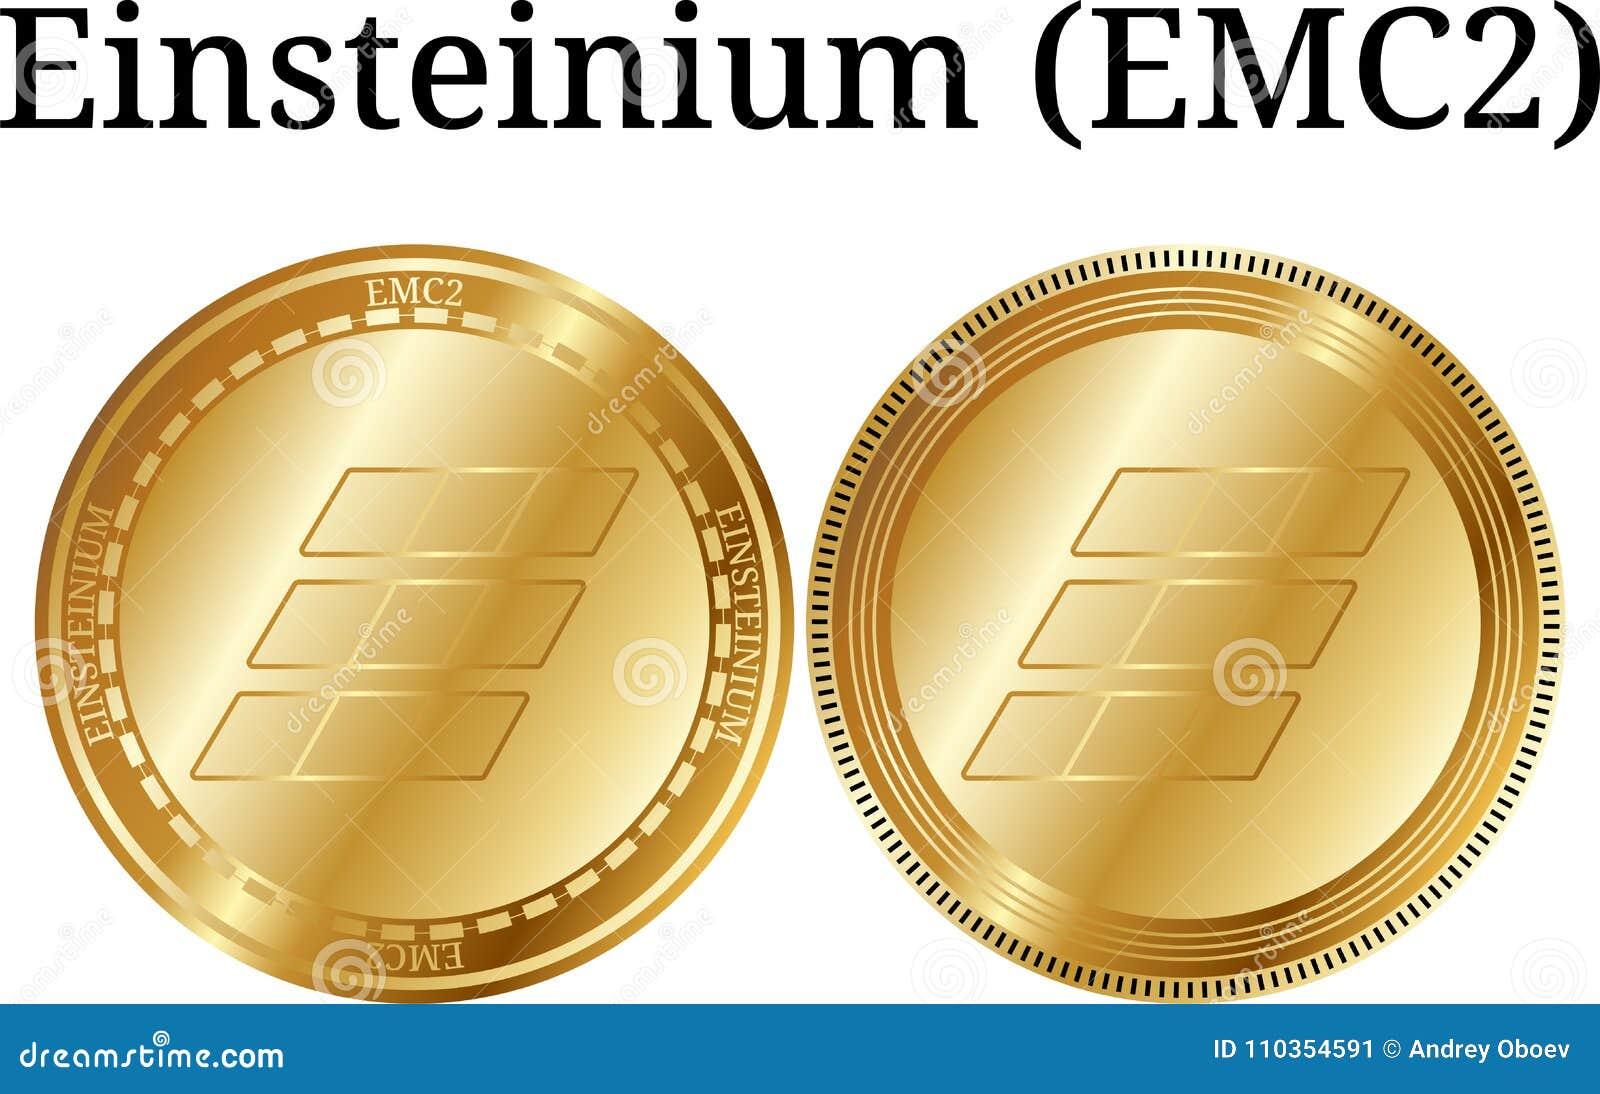 emc2 cryptocurrency buy